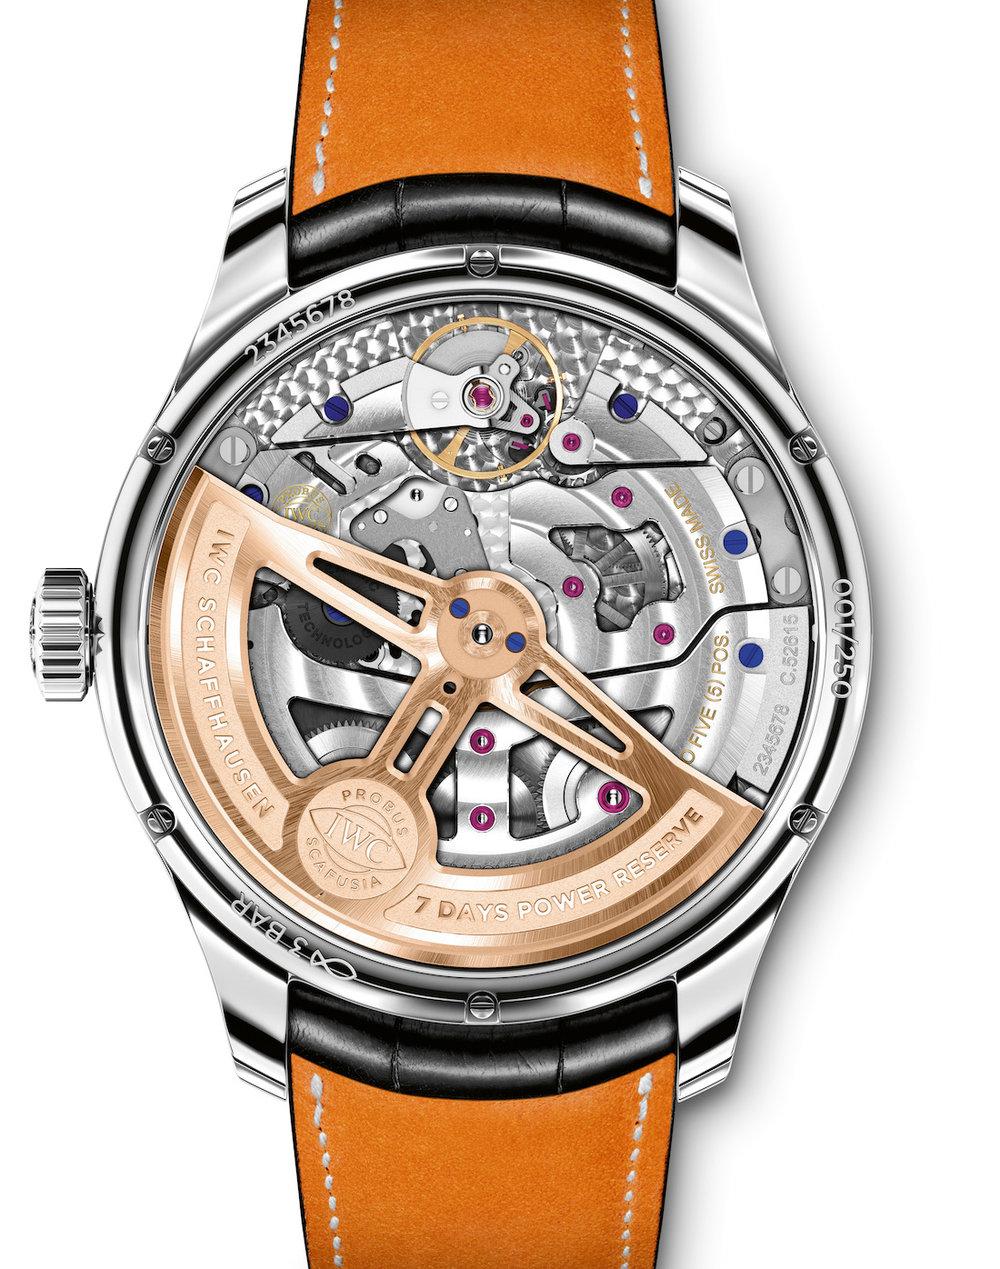 News Iwc Presents Two New Portugieser Watches A Perpetual Calendar 7 Days Slim Platinum Original 100 Ref Iw503406